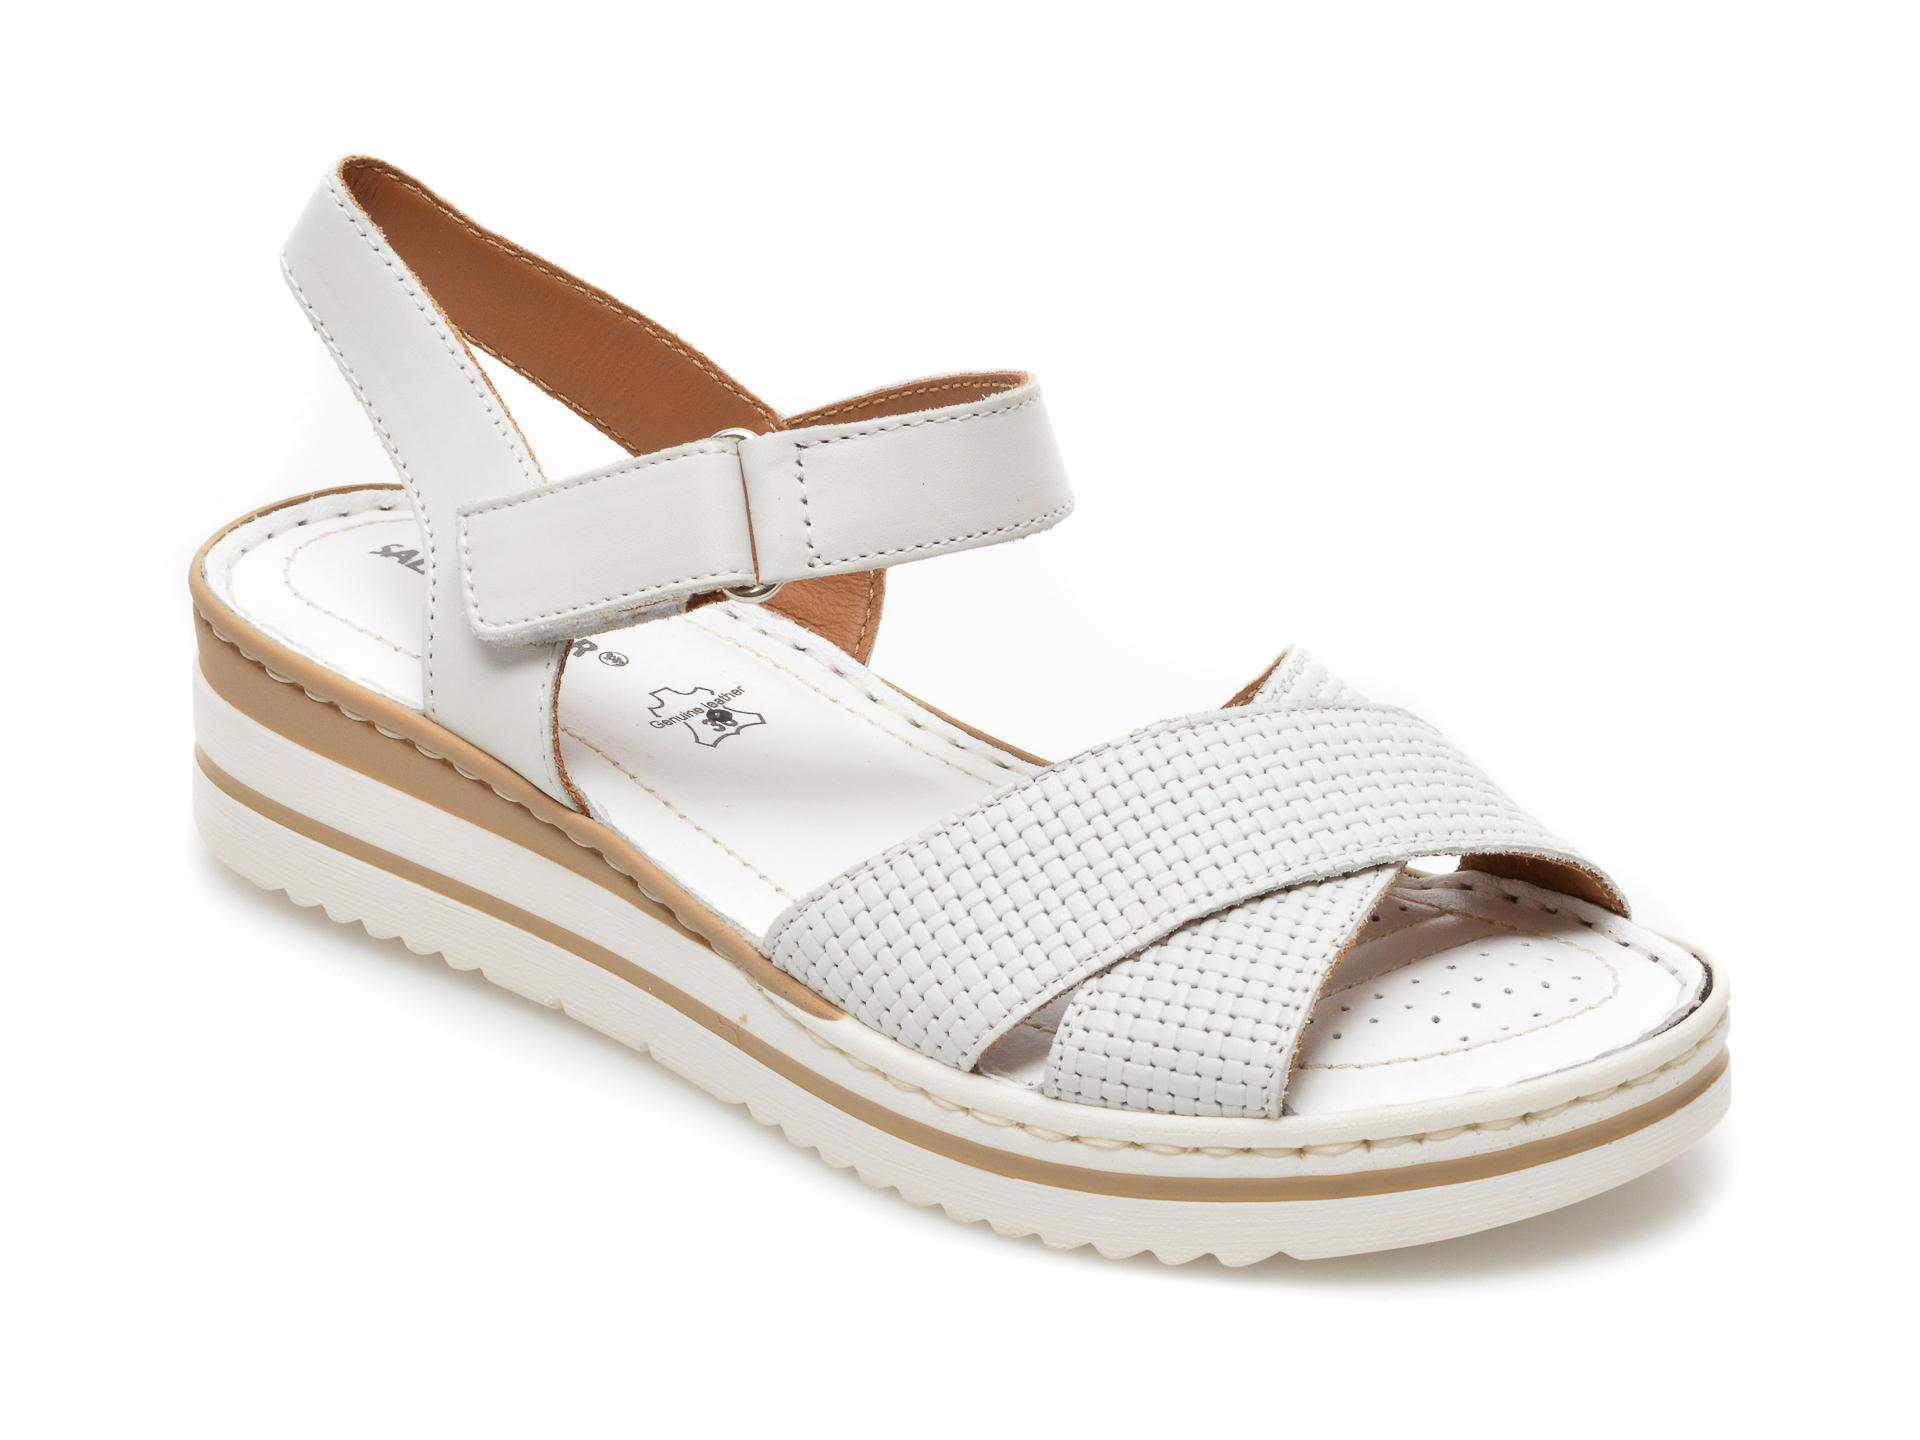 Sandale SALAMANDER albe, 34101, din piele naturala imagine otter.ro 2021